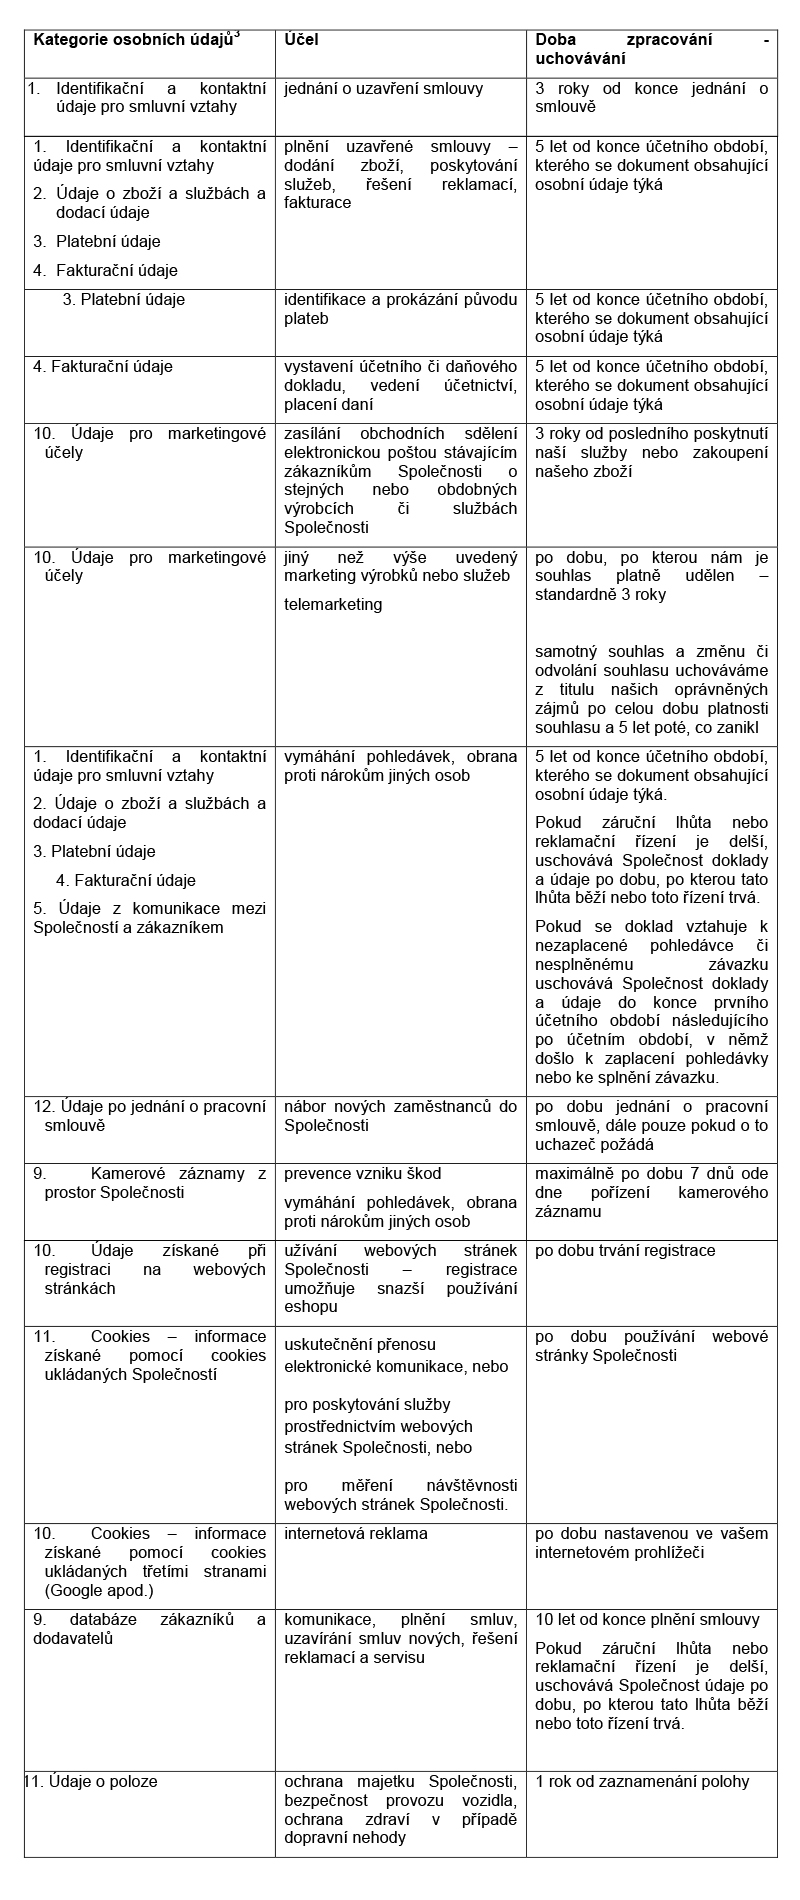 tabulka_partneri_2